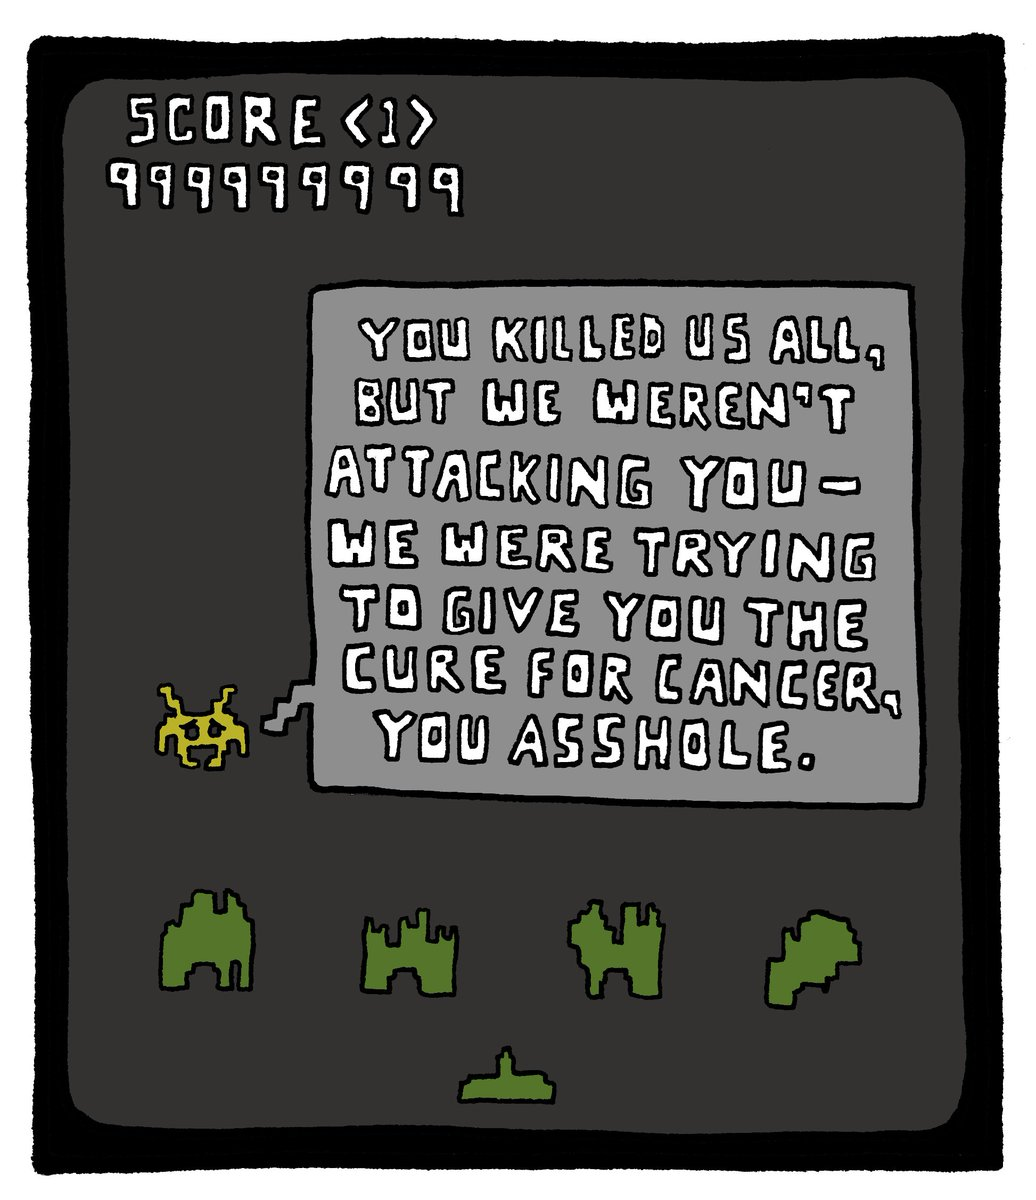 RT @joeyalison: I finally beat Space Invaders!!! https://t.co/uwnoqAiRjY